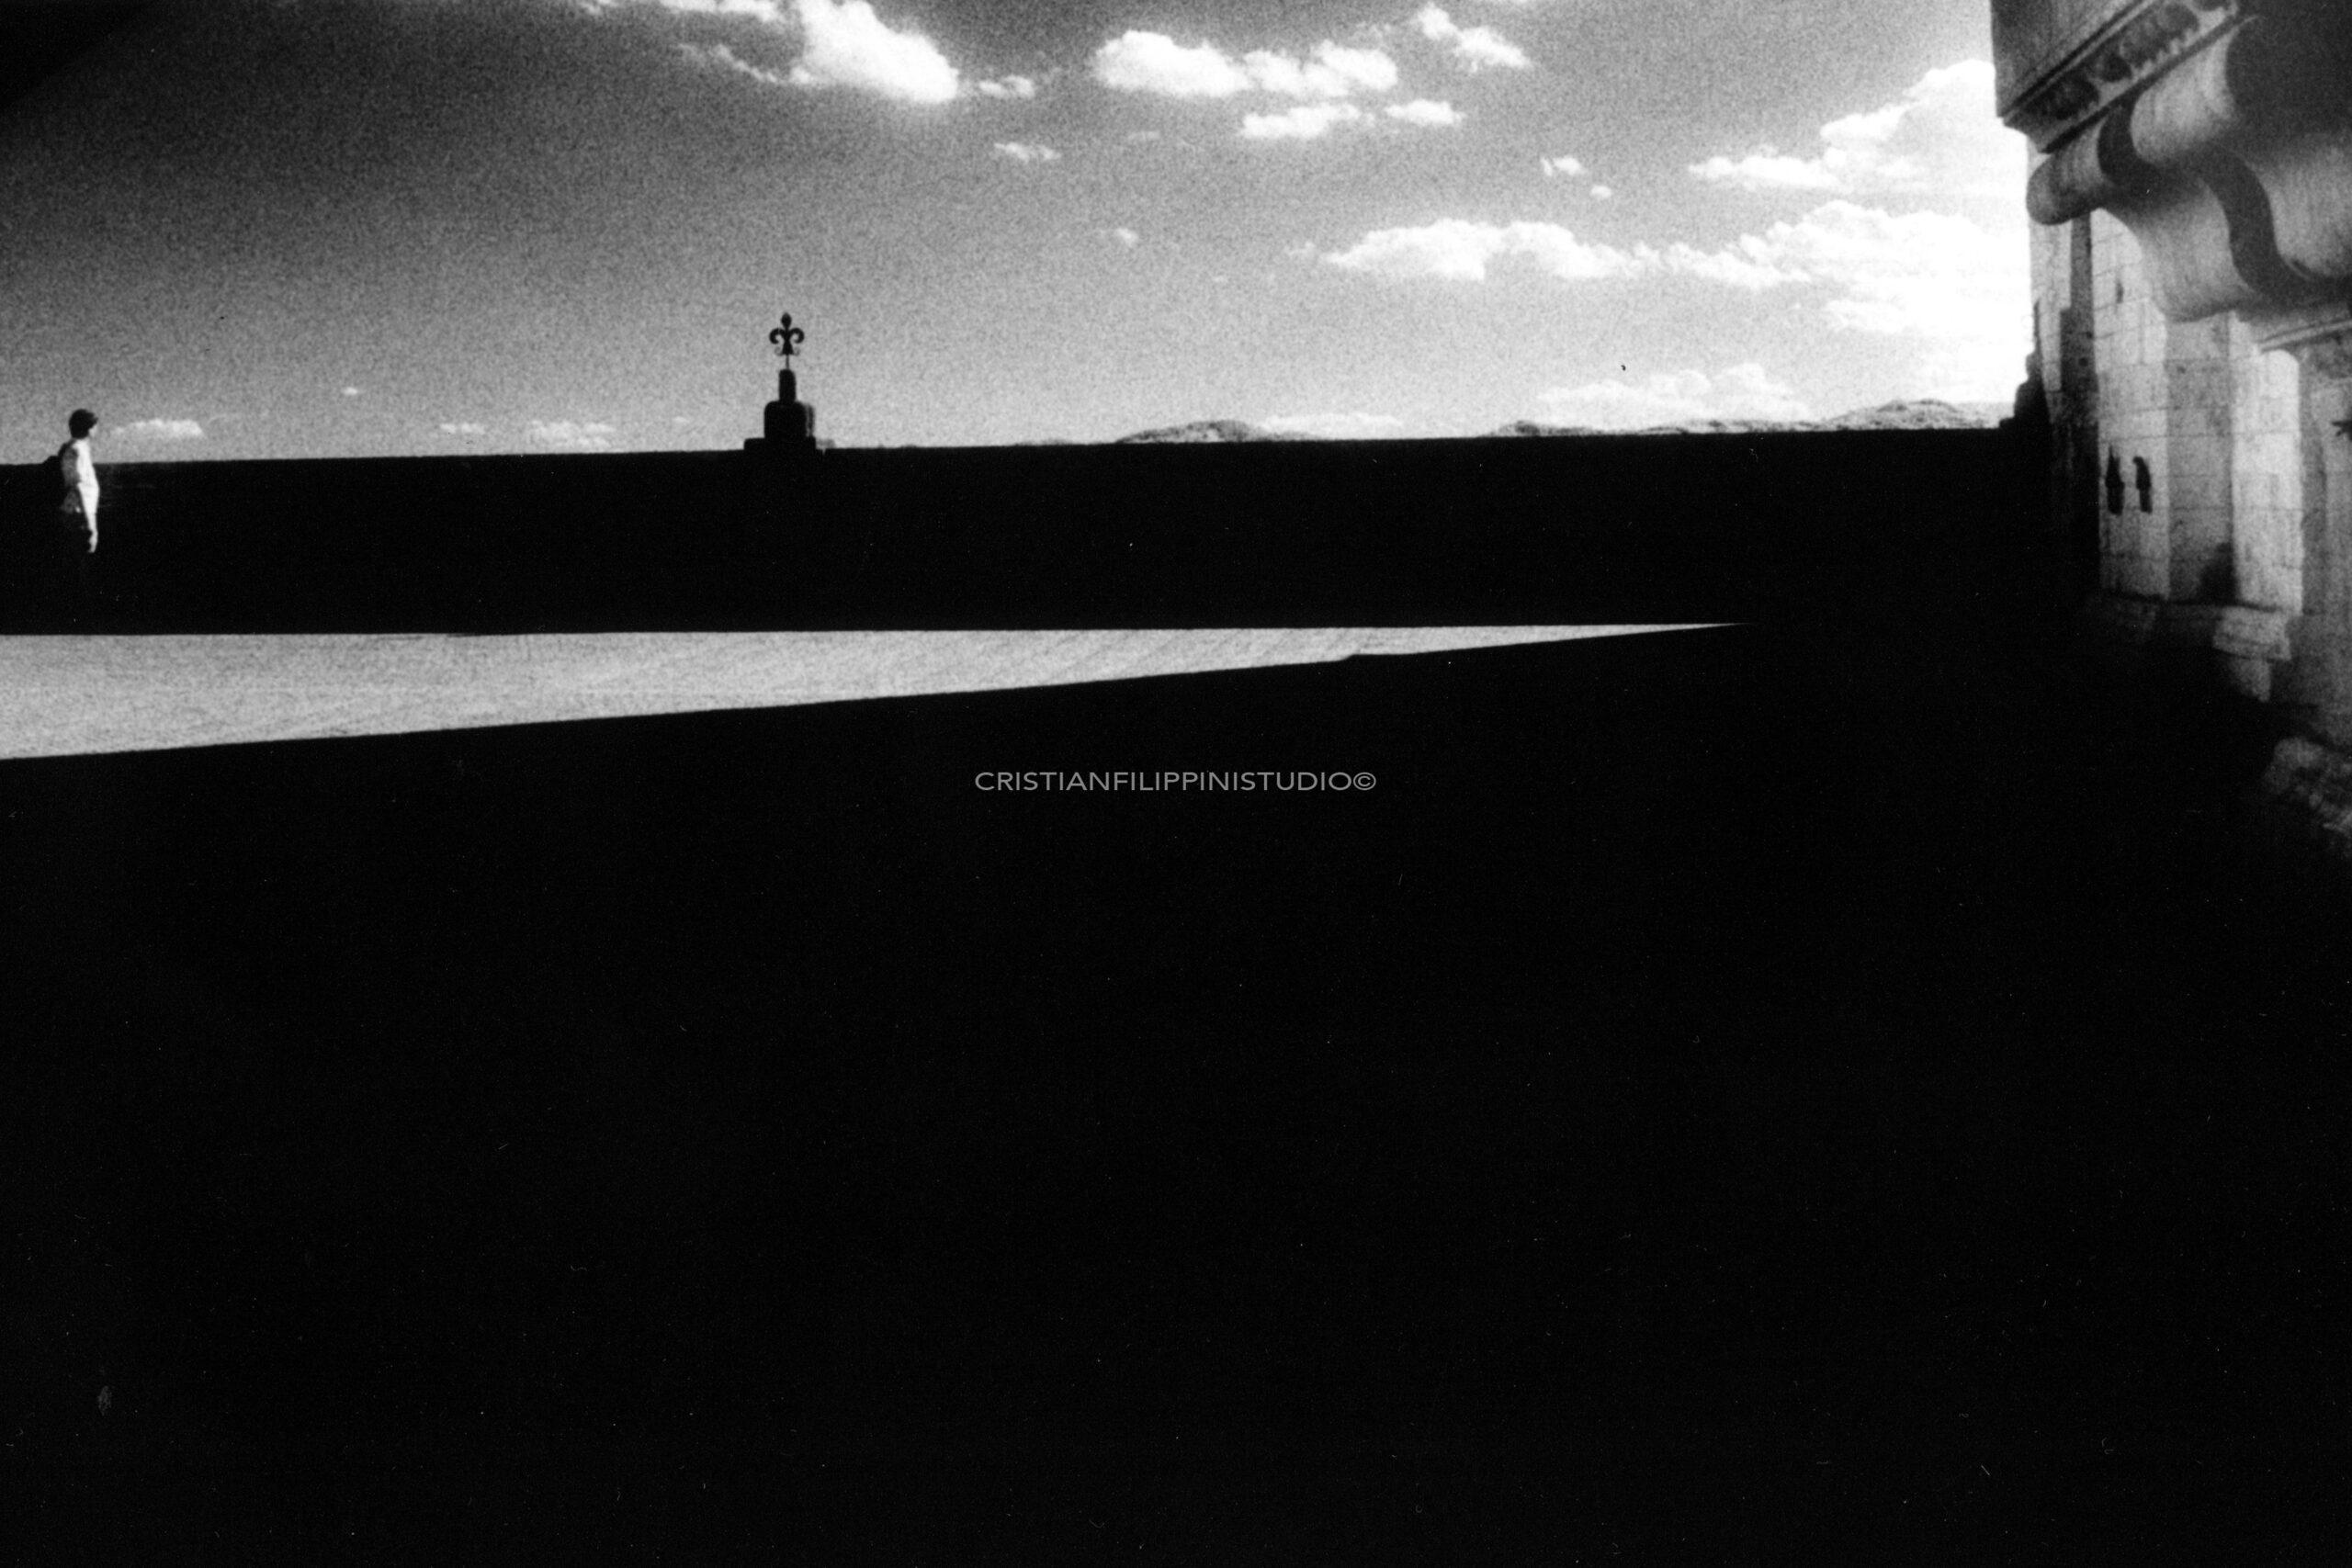 Gubbio Italy   Cristian Filippini Studio © Fine Art Photography Video & Advertising